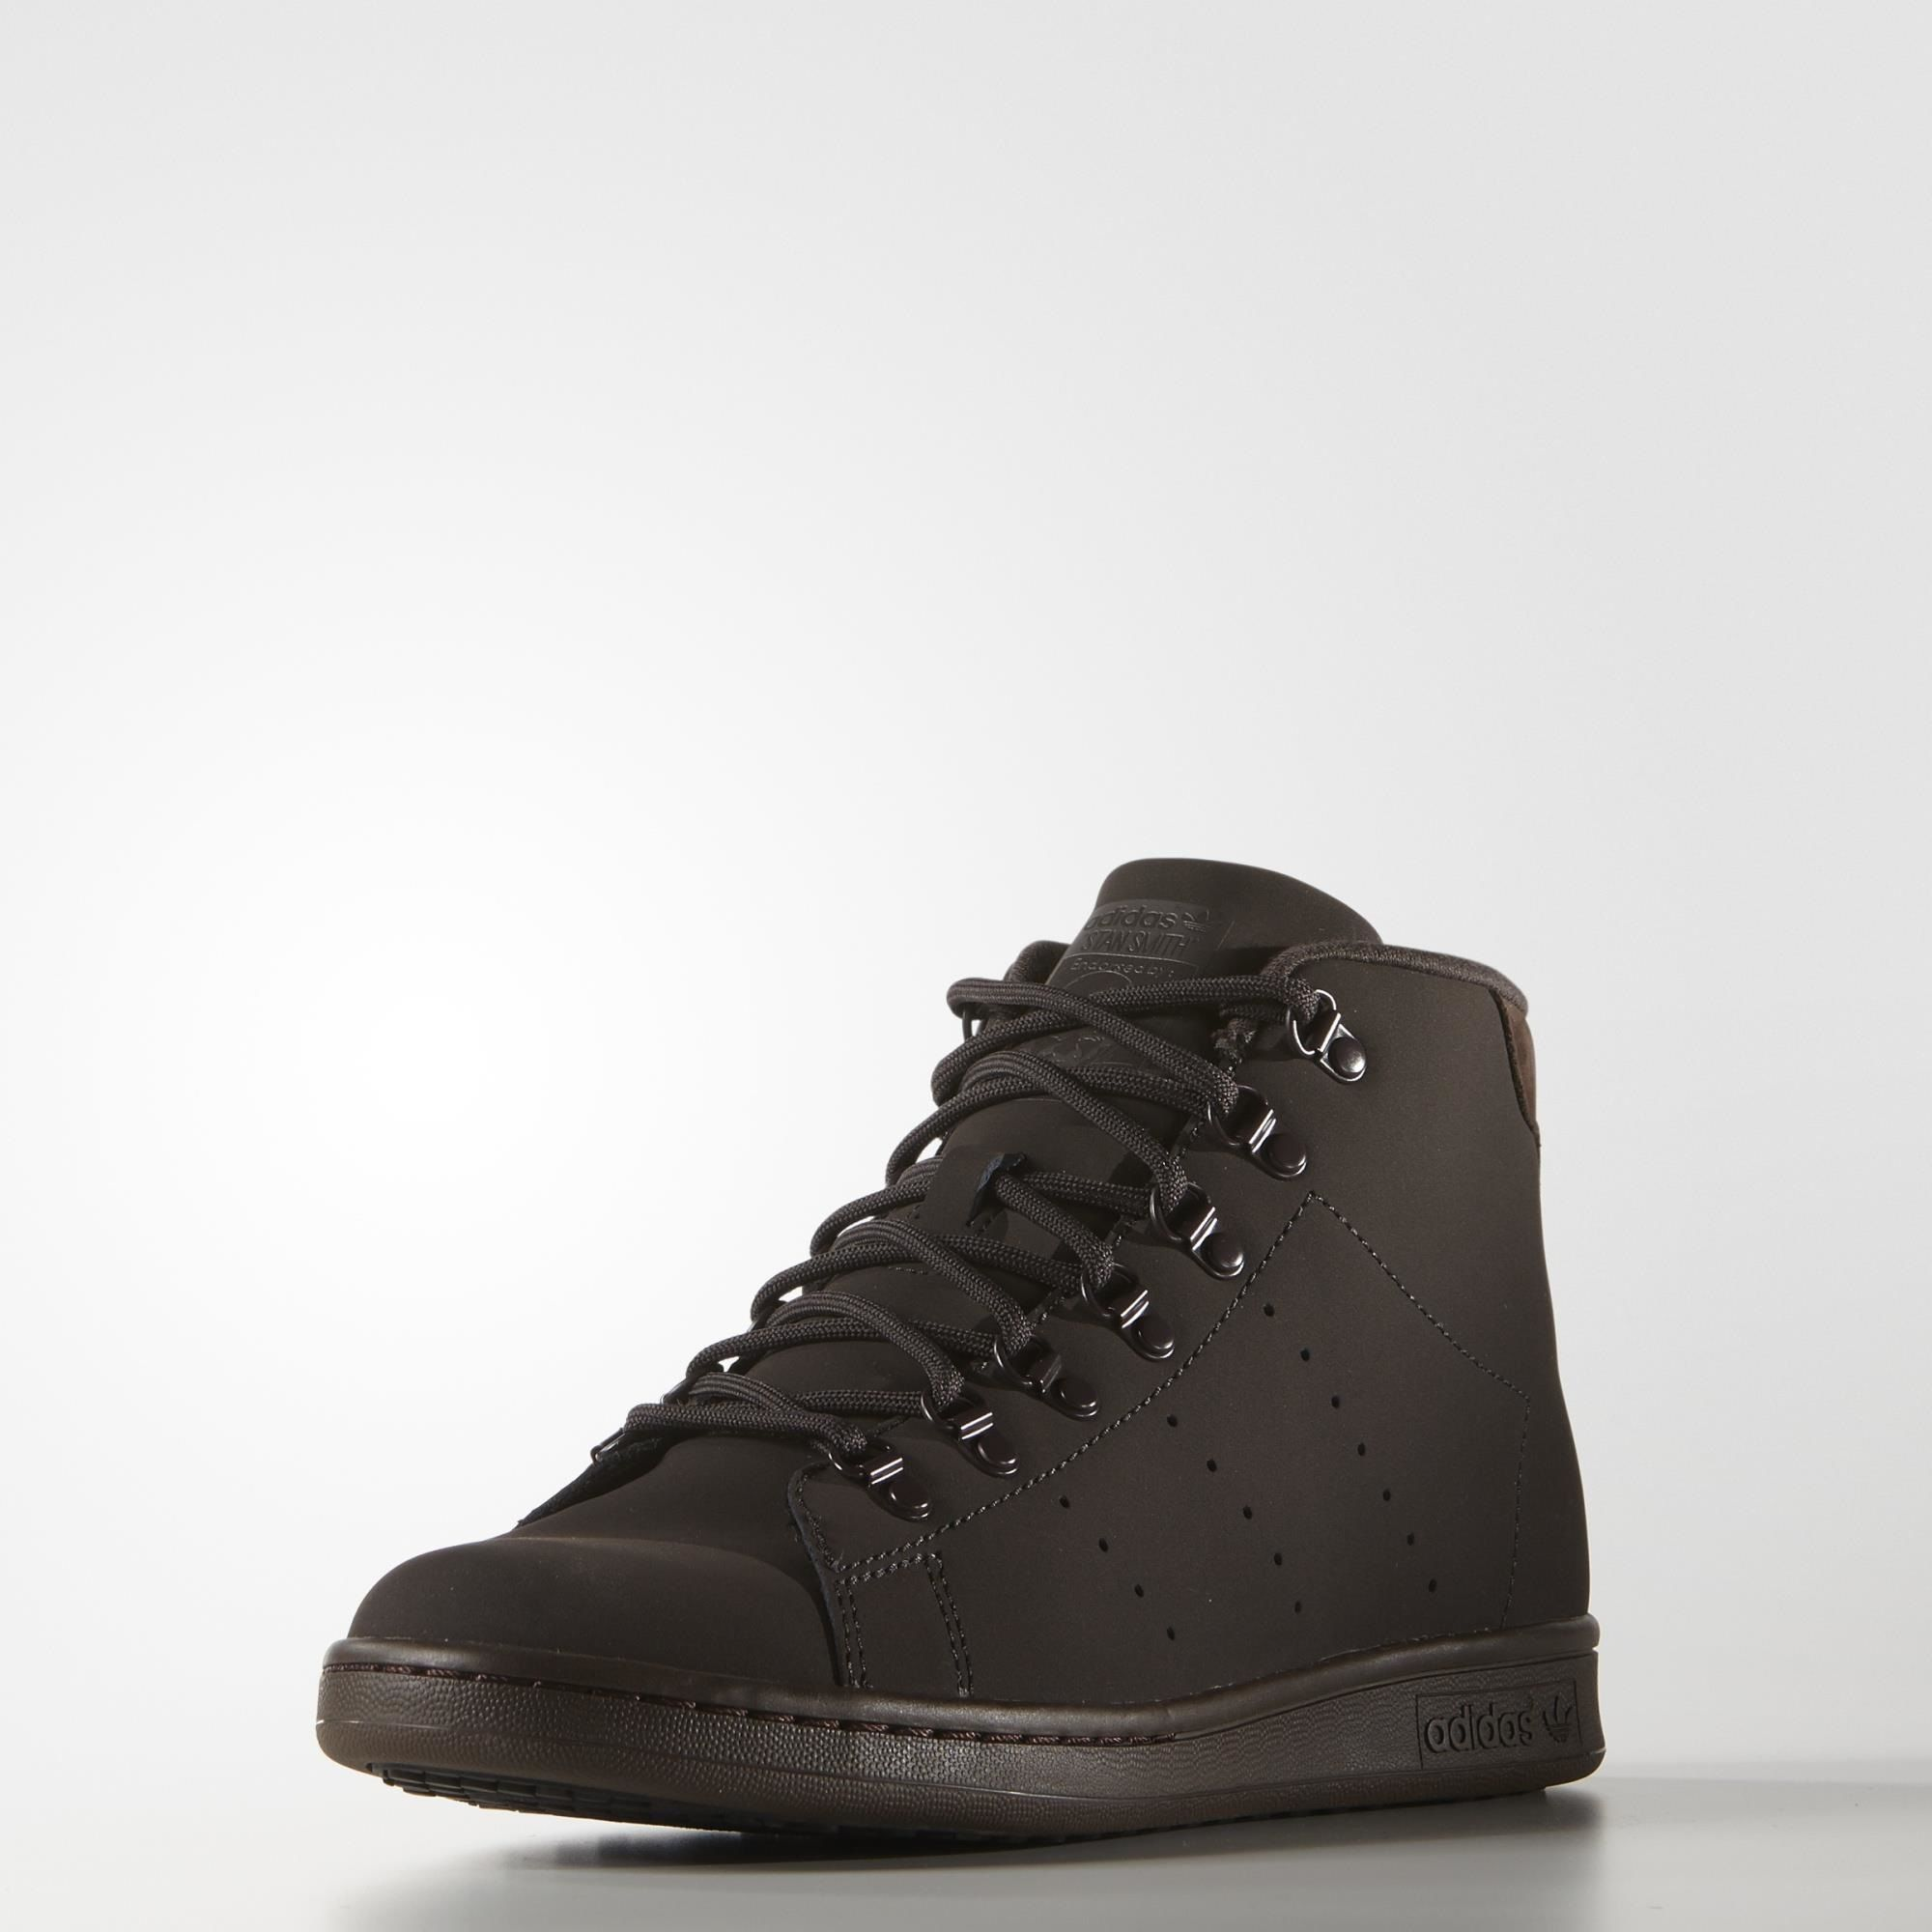 adidas Stan Smith Winter Schoenen - bruin | adidas Nederland | Shoes |  Pinterest | Adidas, Water and Stan smith